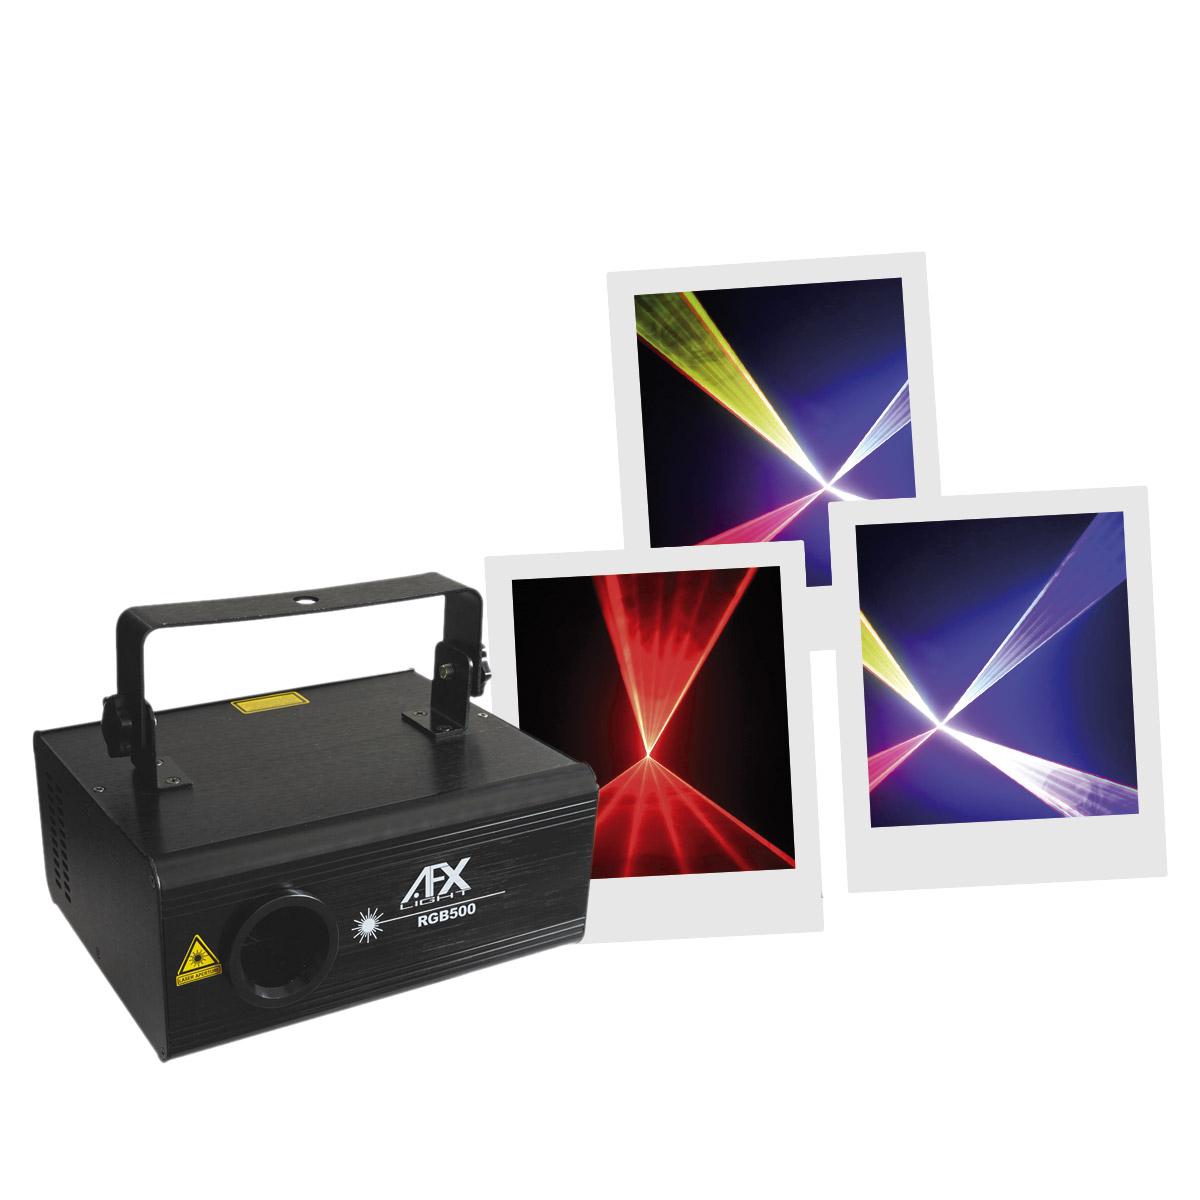 Laser Multicolore AFX Light - RGB500